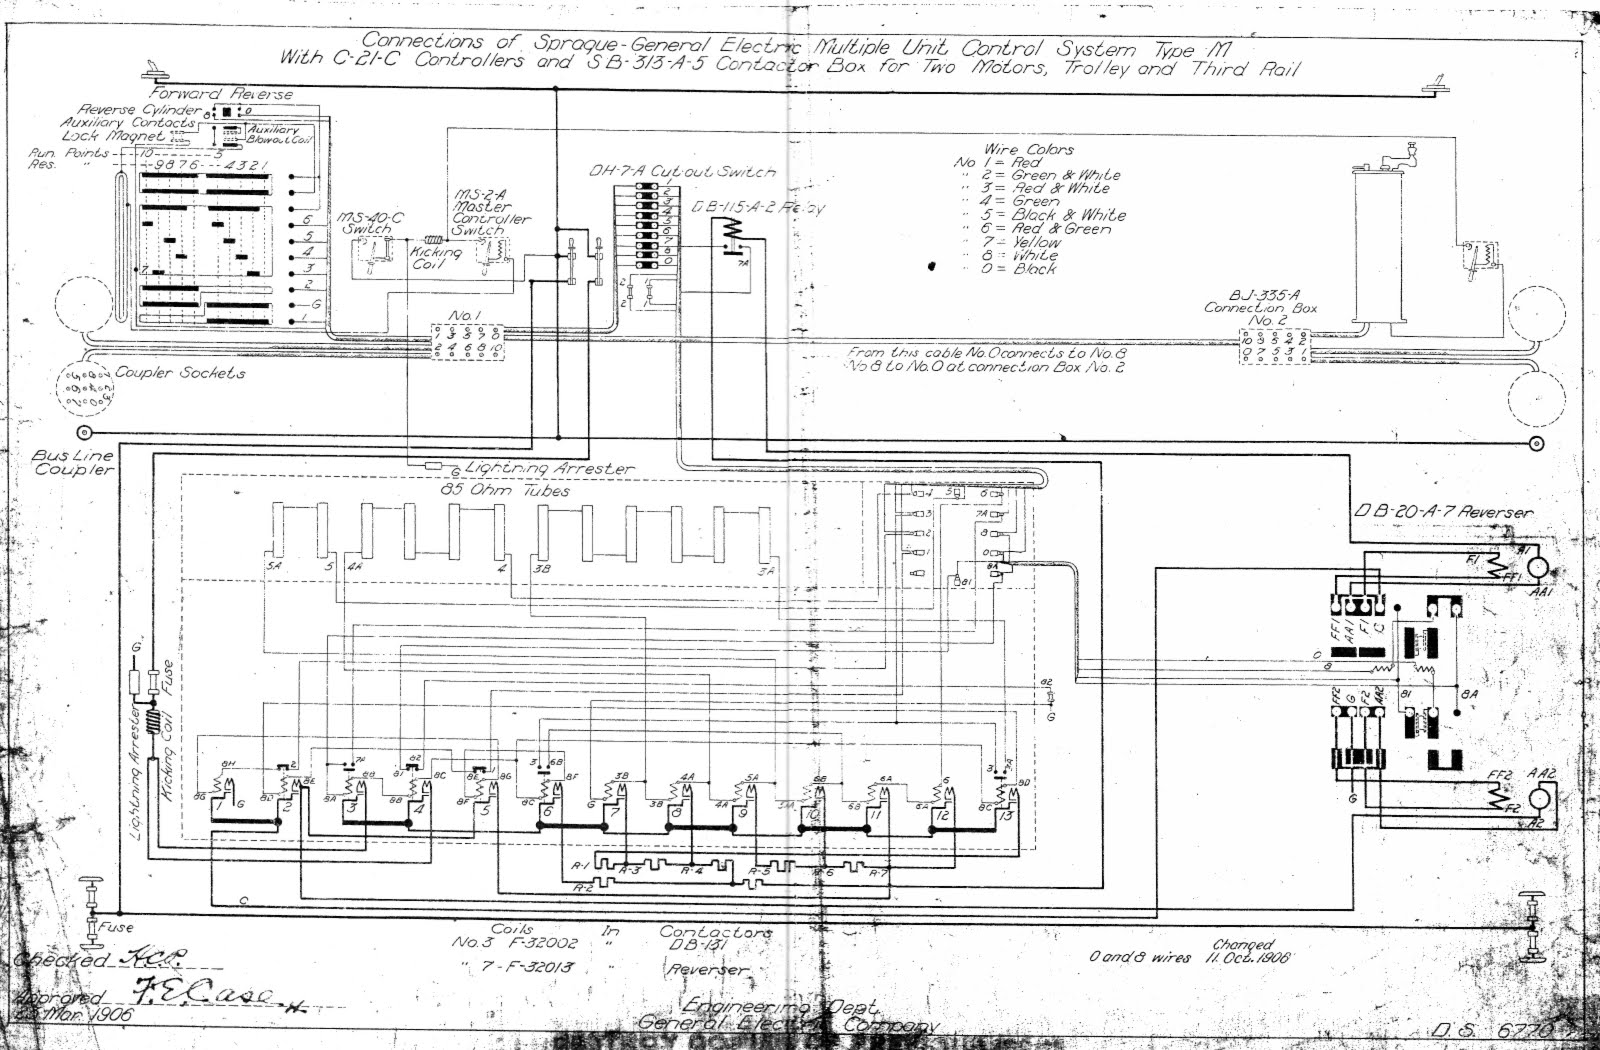 Glamorous 1971 Honda Cb350 Wiring Diagram Images - Best Image ...